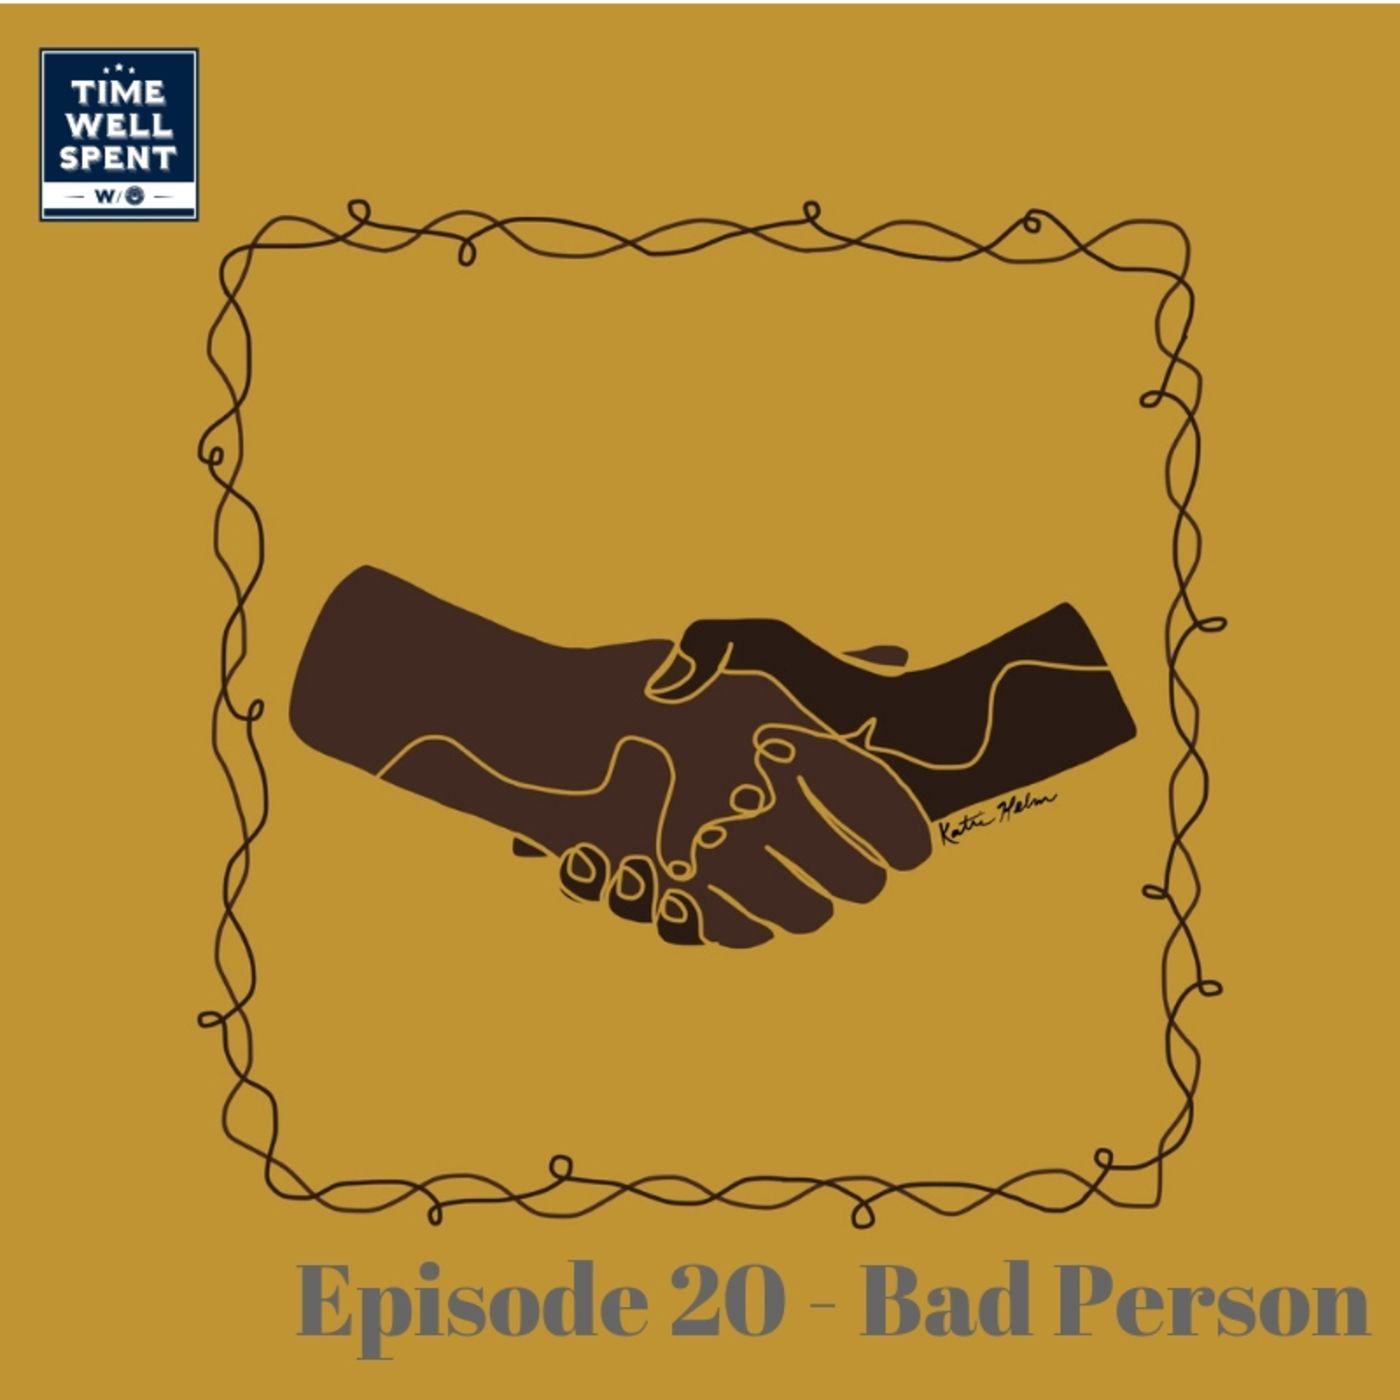 Episode 20 - Bad Person